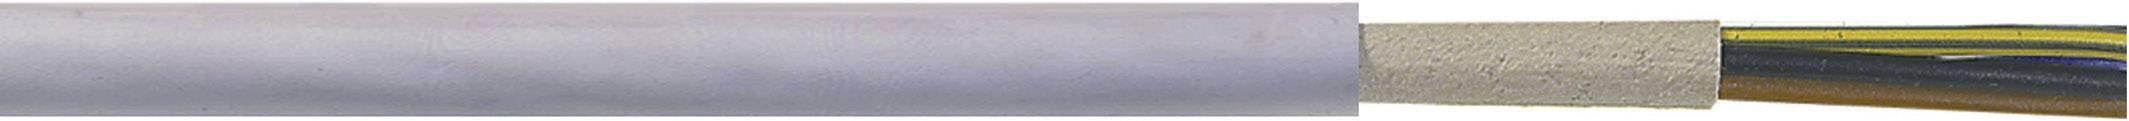 Opláštené vedenie LappKabel NYM-J 1600012, 1 G 16 mm², 100 m, sivá